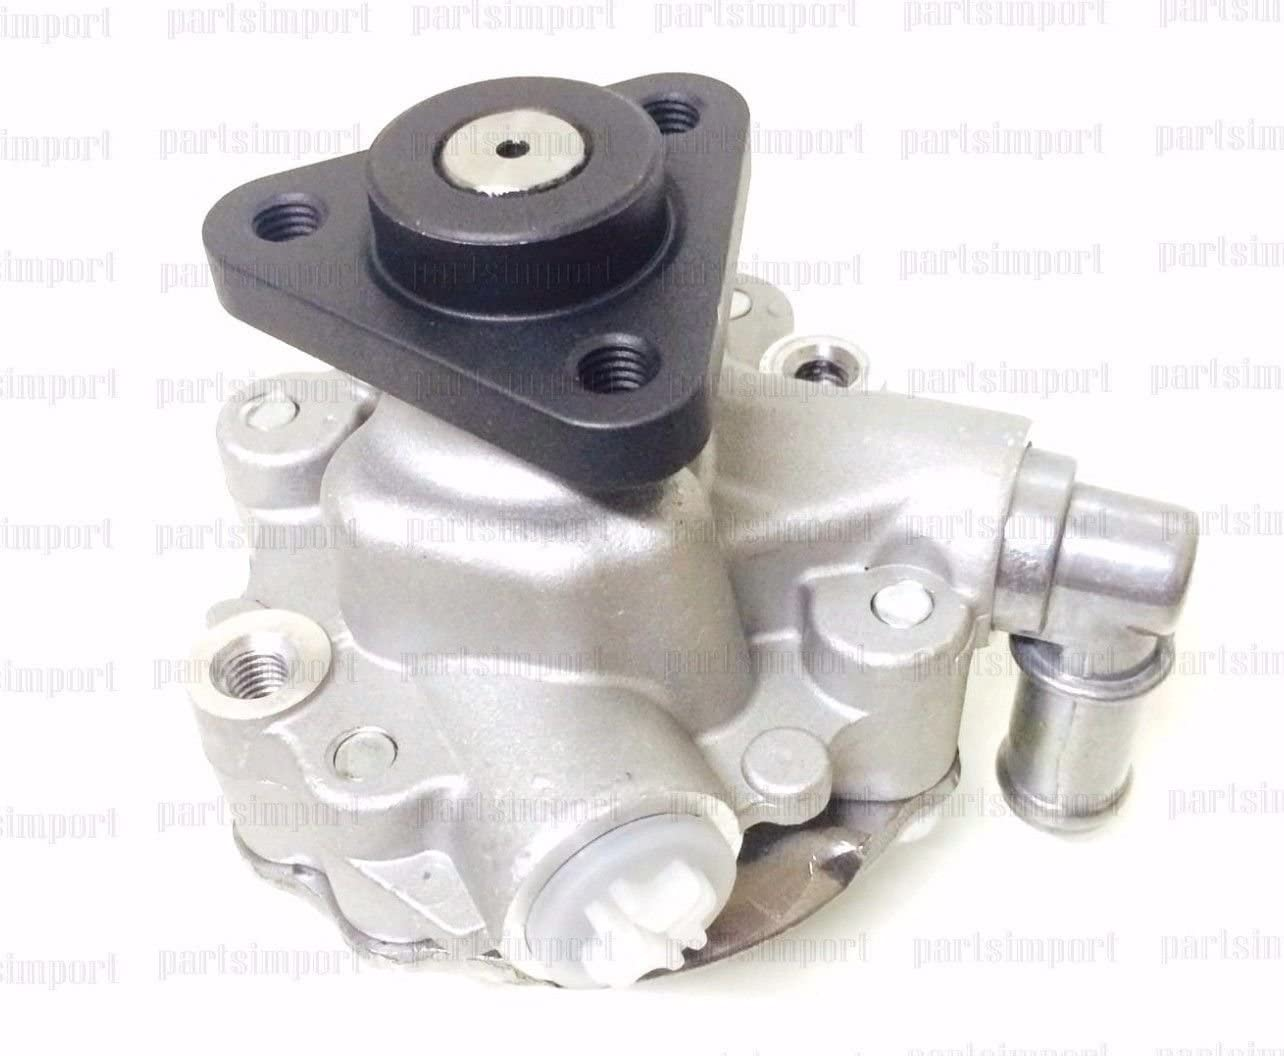 Power Steering Pump BMW E46 00-05 323Ci 323i 325Ci 325i 328Ci 328i 330Ci 330i EURO PARTS